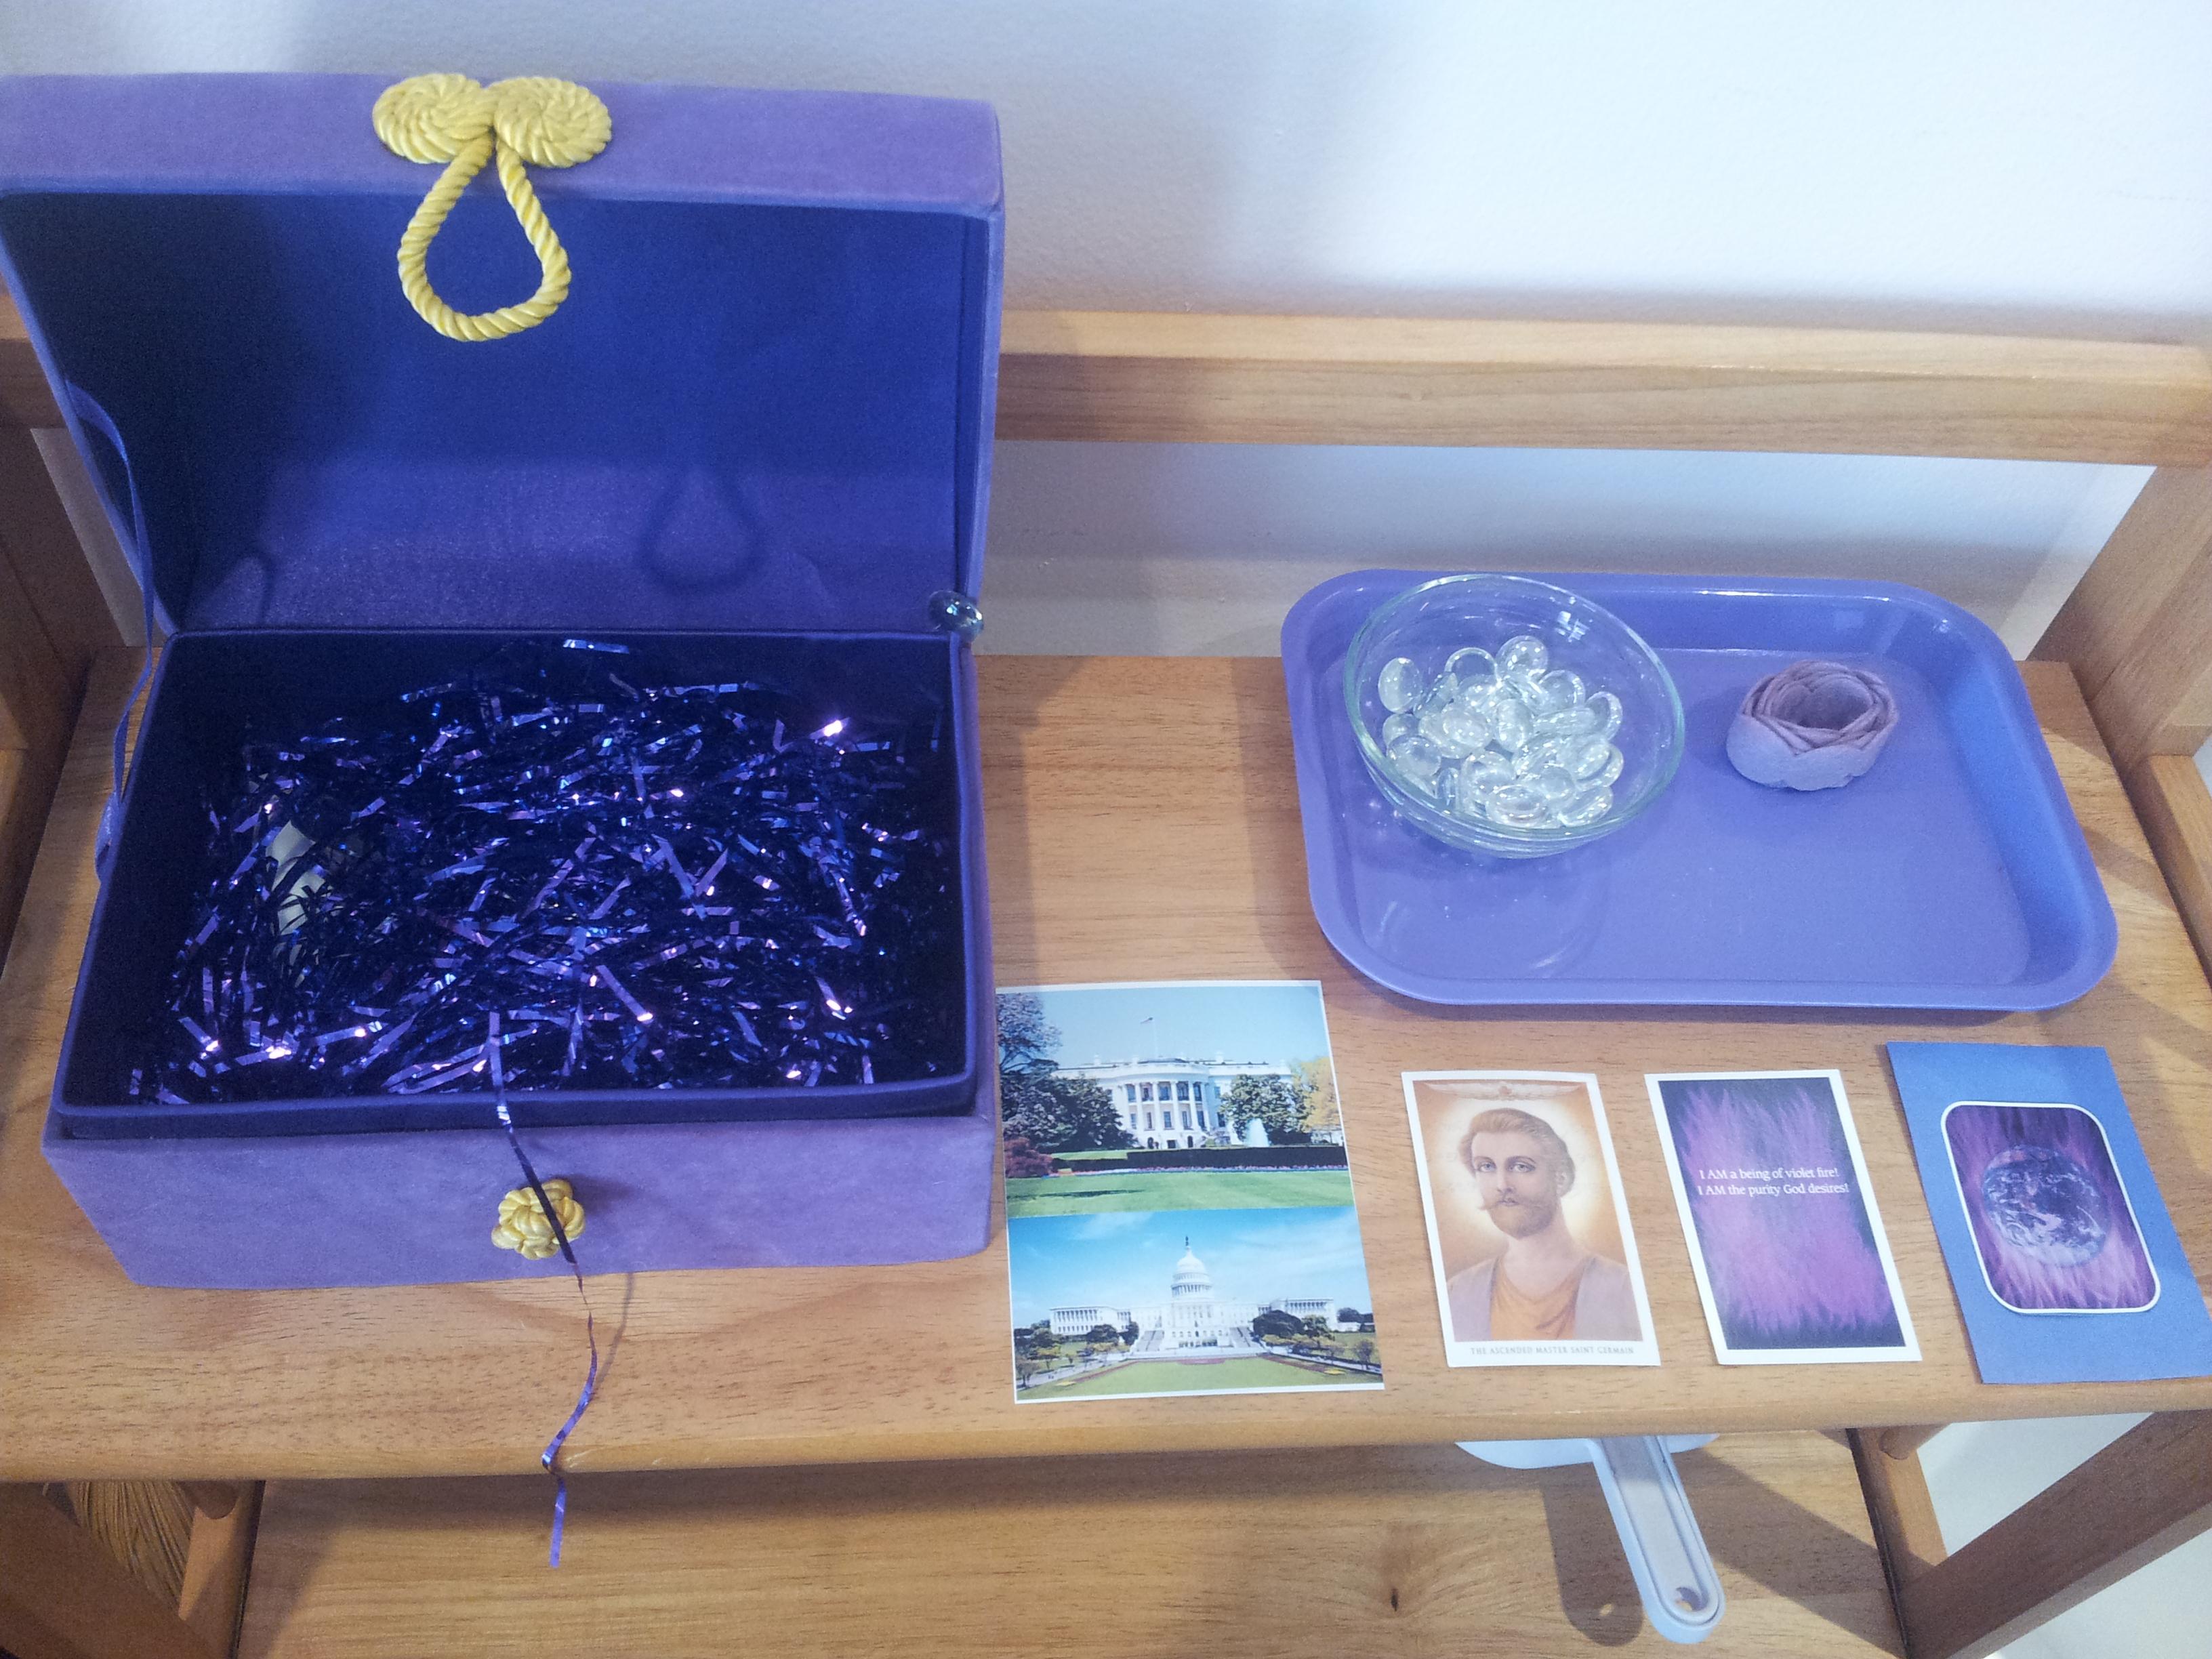 Children's Violet Flame Activity